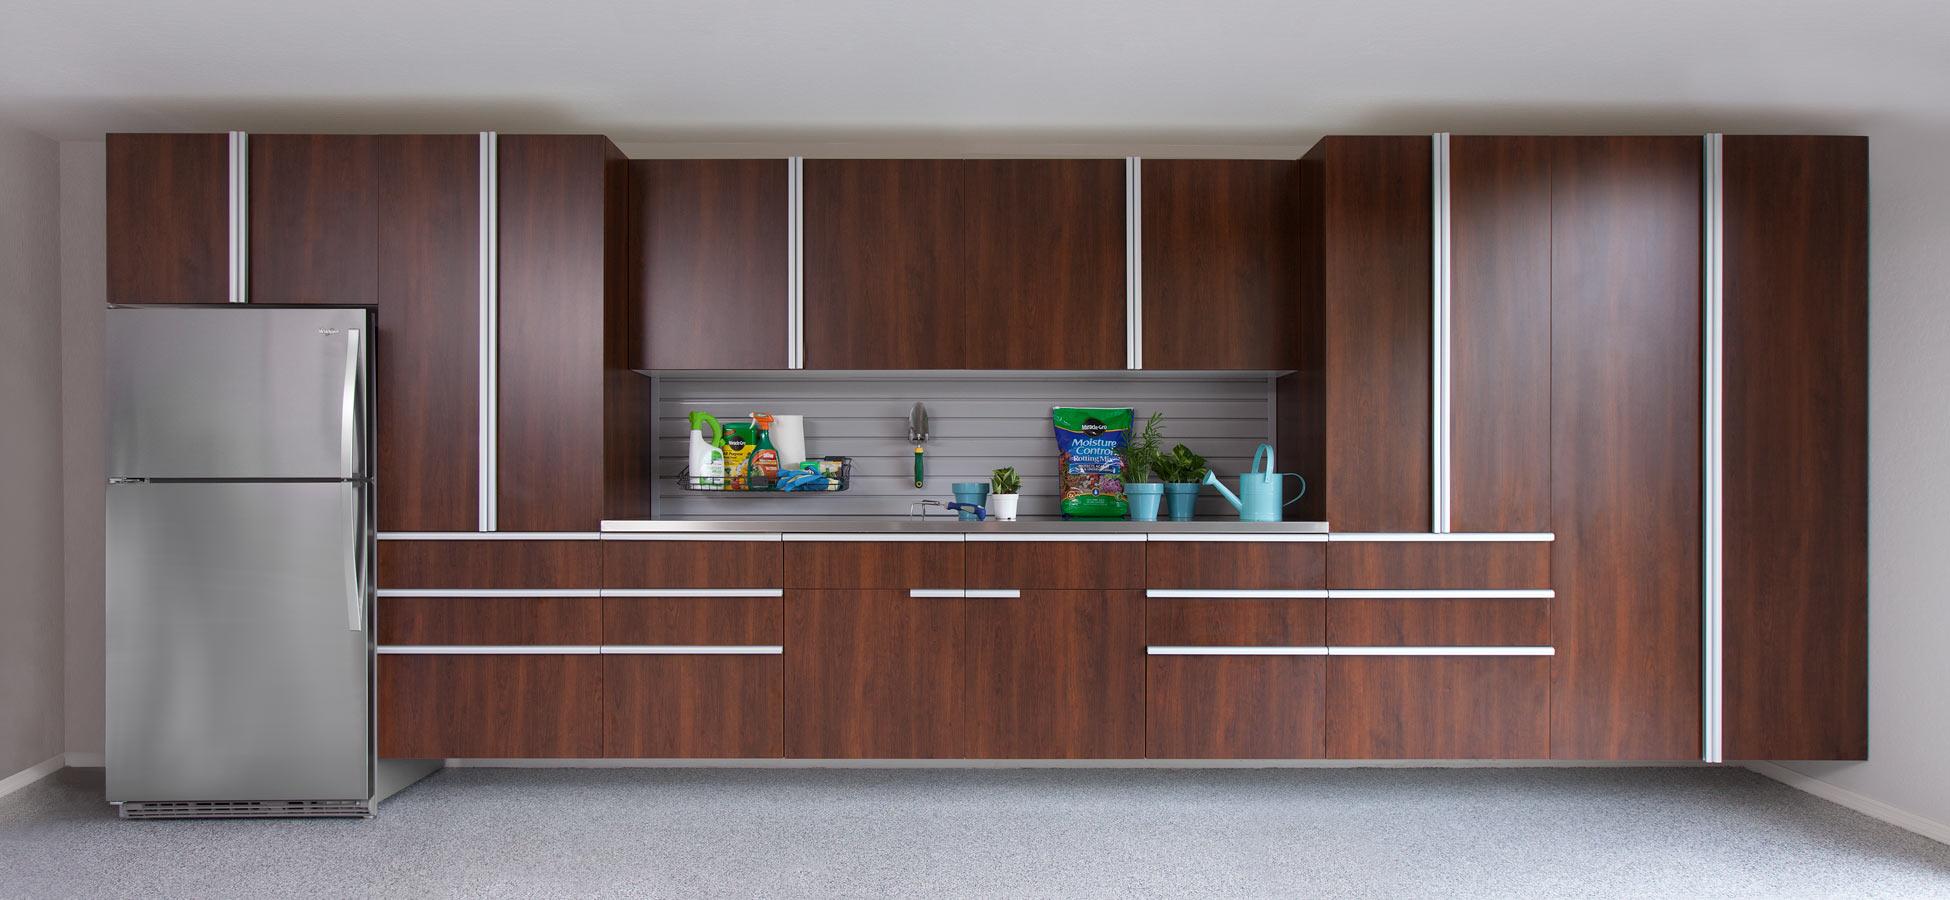 Traditional Garage Cabinet Design In Phoenix Scottsdale Az